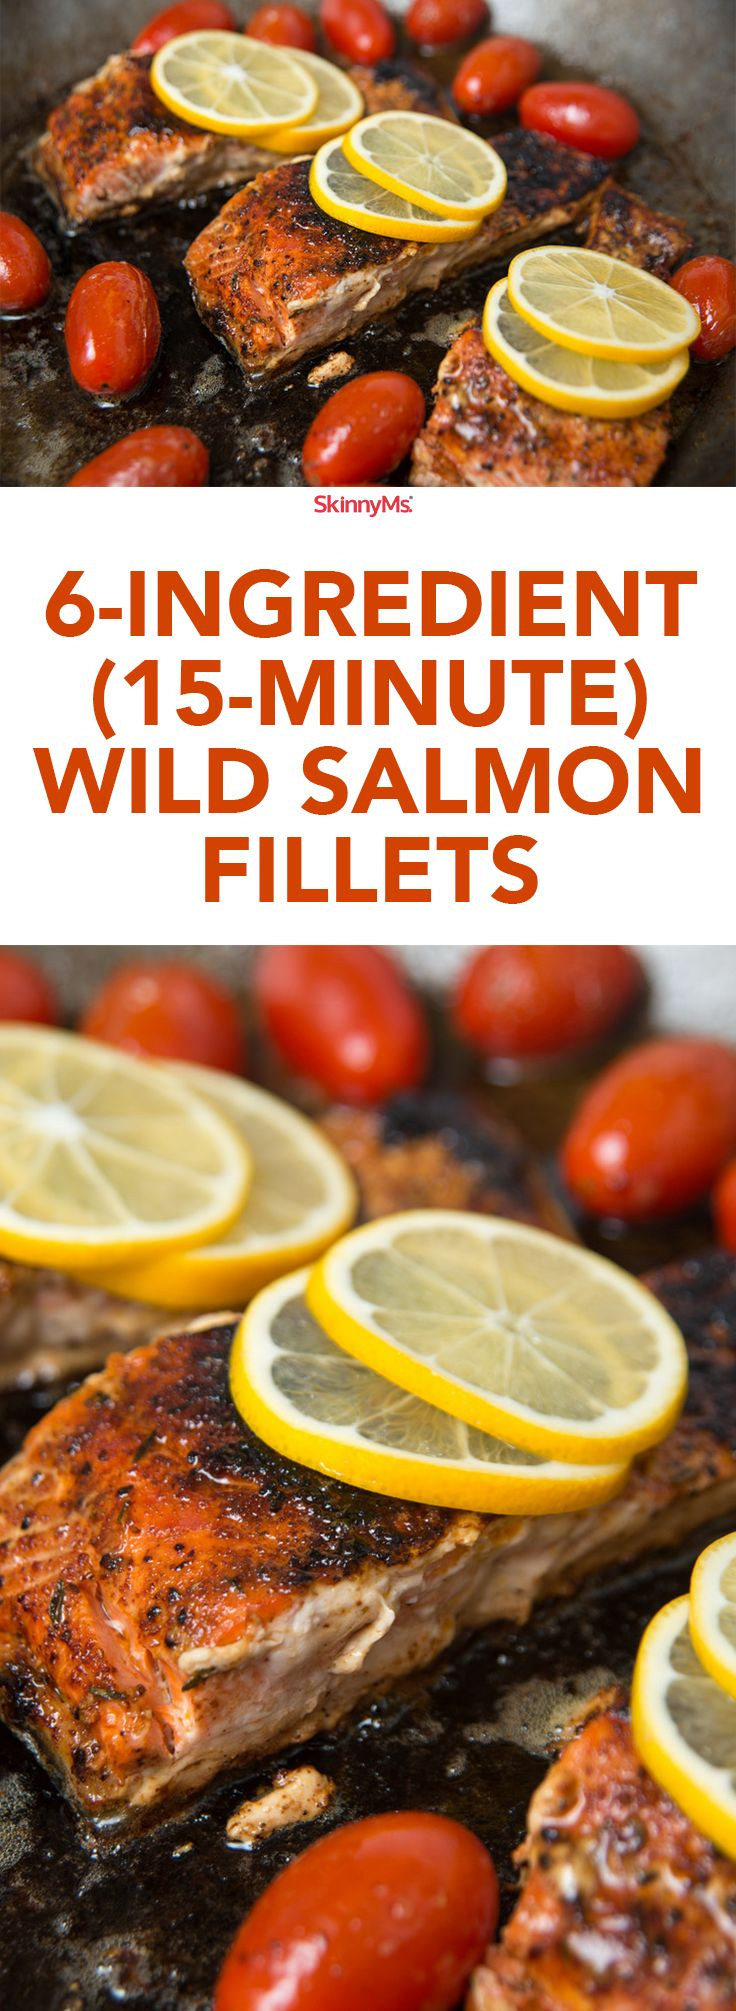 6ingredient Wild Salmon Fillets Cooking Salmoncooking Fishwhat's